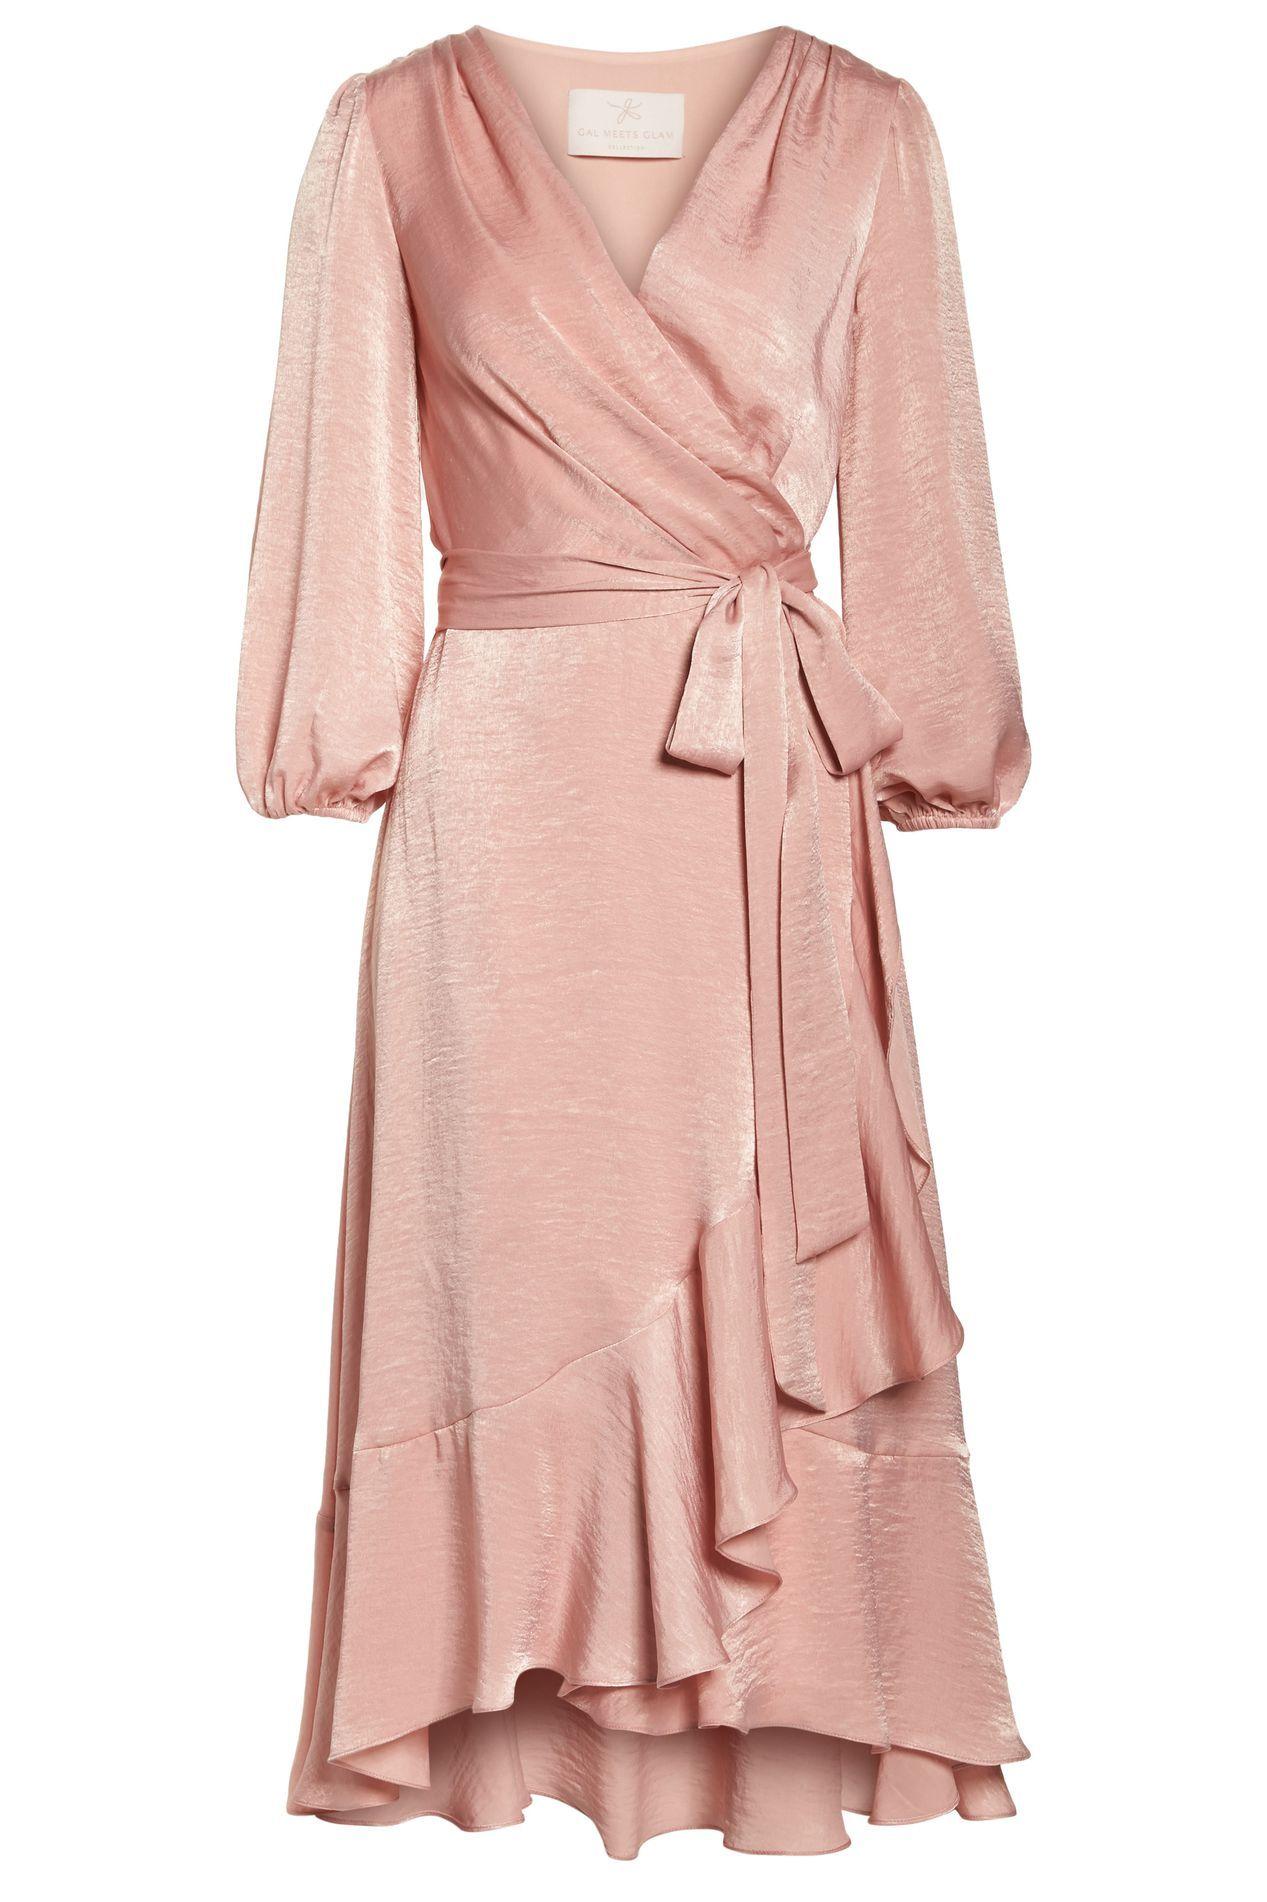 7a5cc8f8a81 30 Elegant Fall Wedding Guest Dresses 2018 - What to Wear to a Fall Wedding